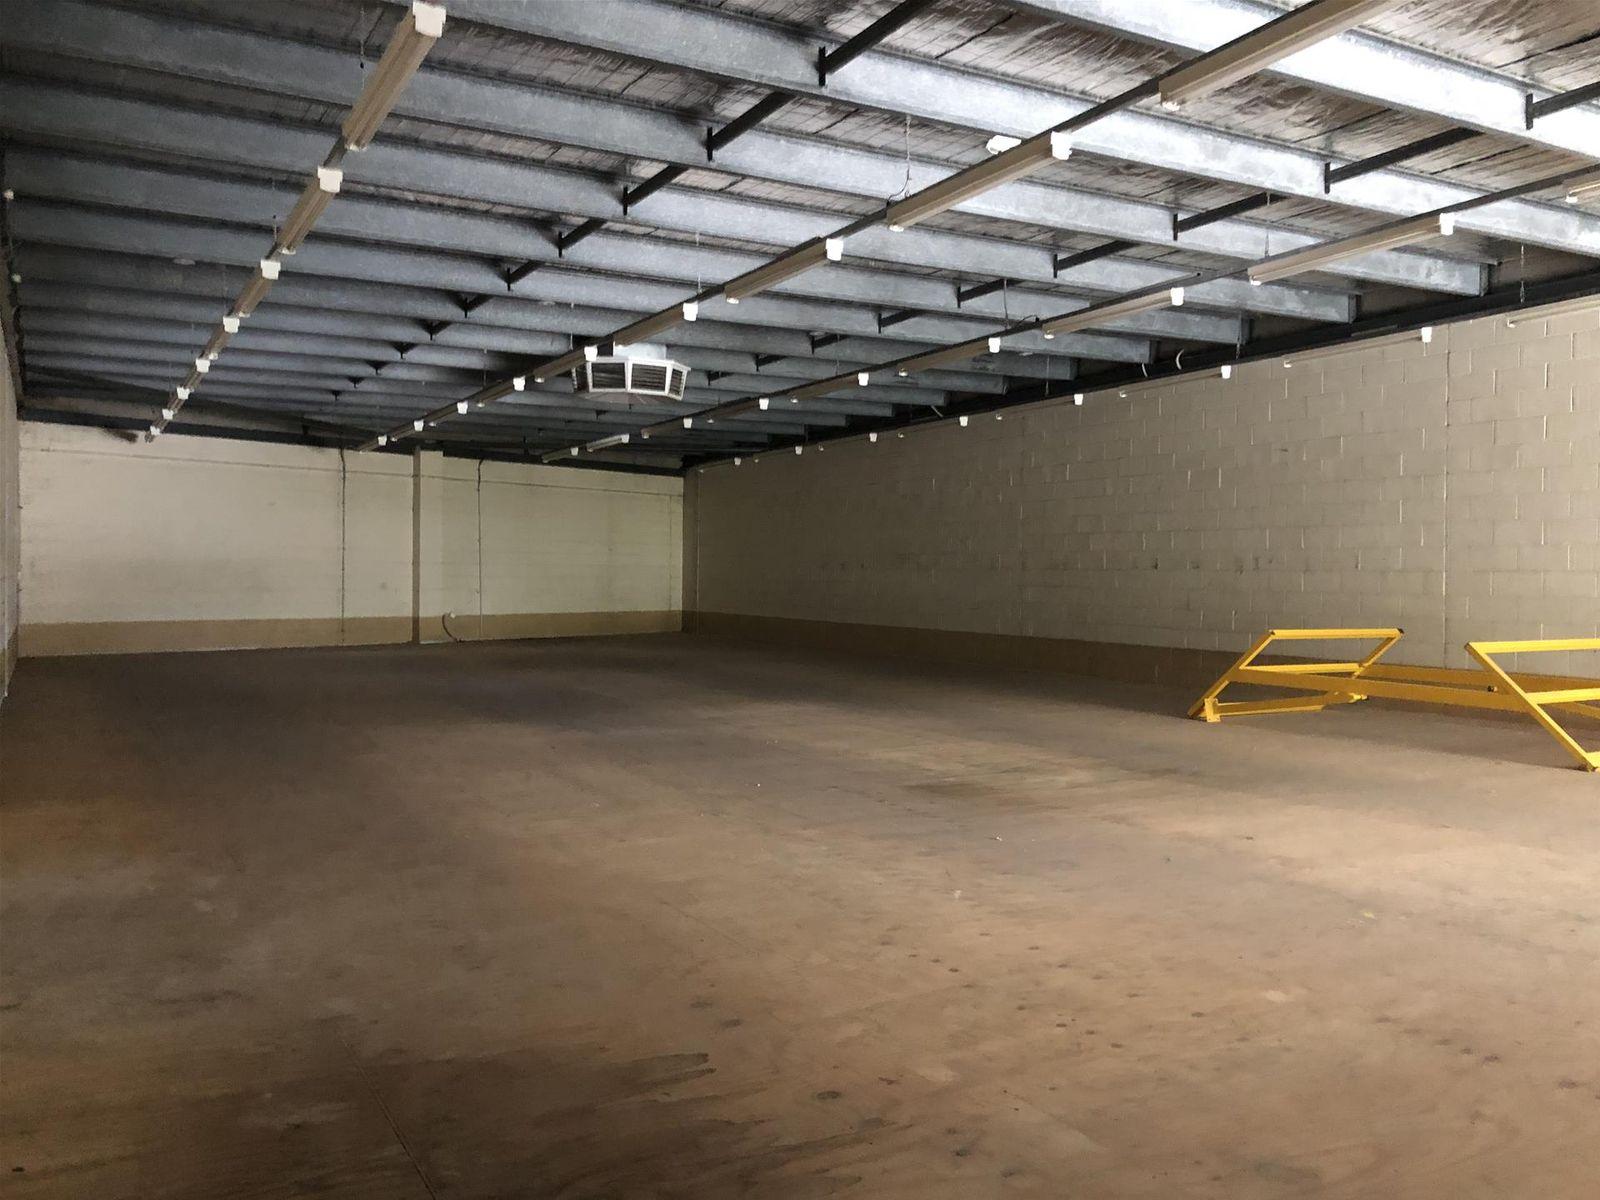 2/15 Parramatta Road, Underwood, QLD 4119